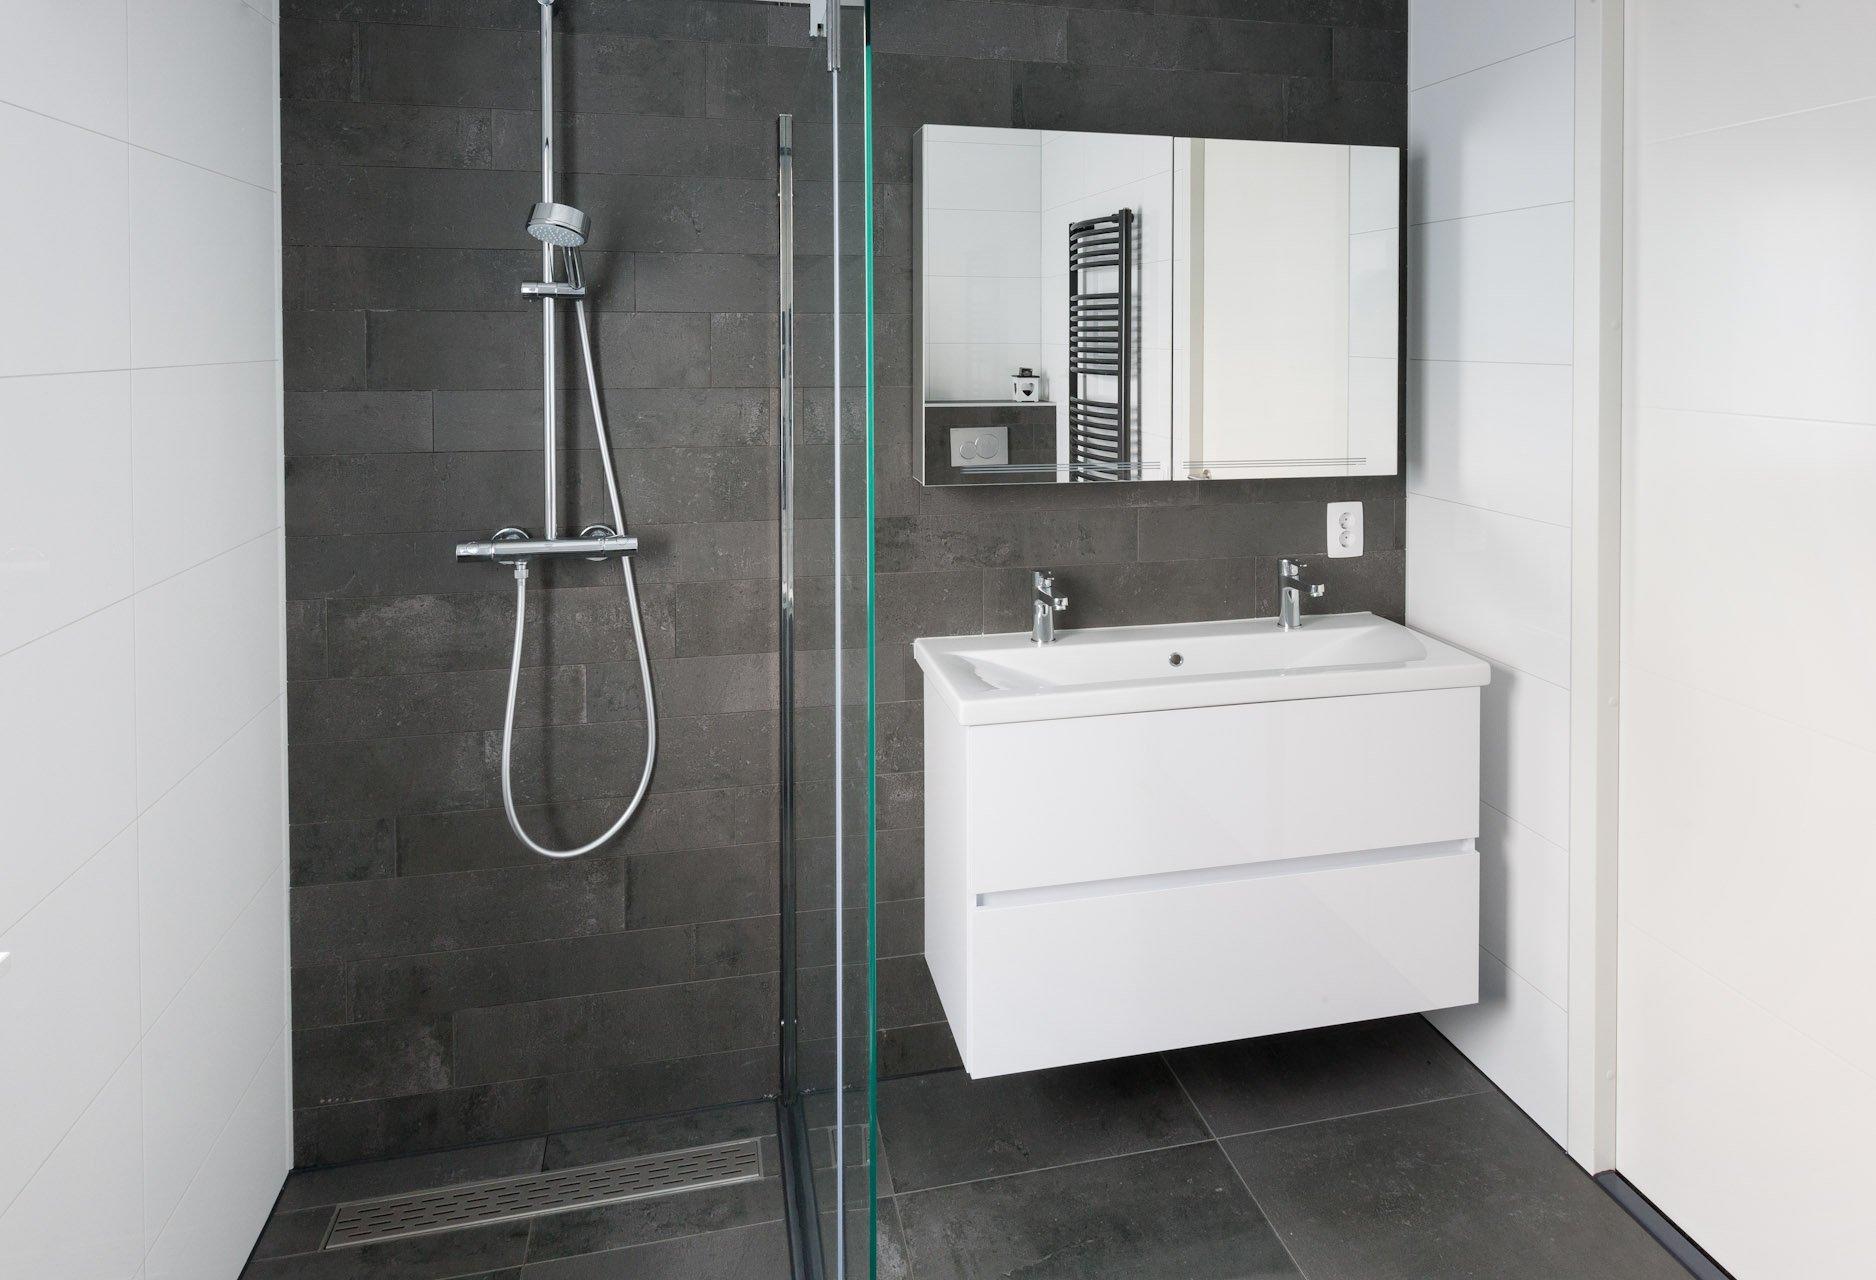 Badkamer Tegels Kalk : Badkamer tegels kalk referenties op huis ontwerp interieur